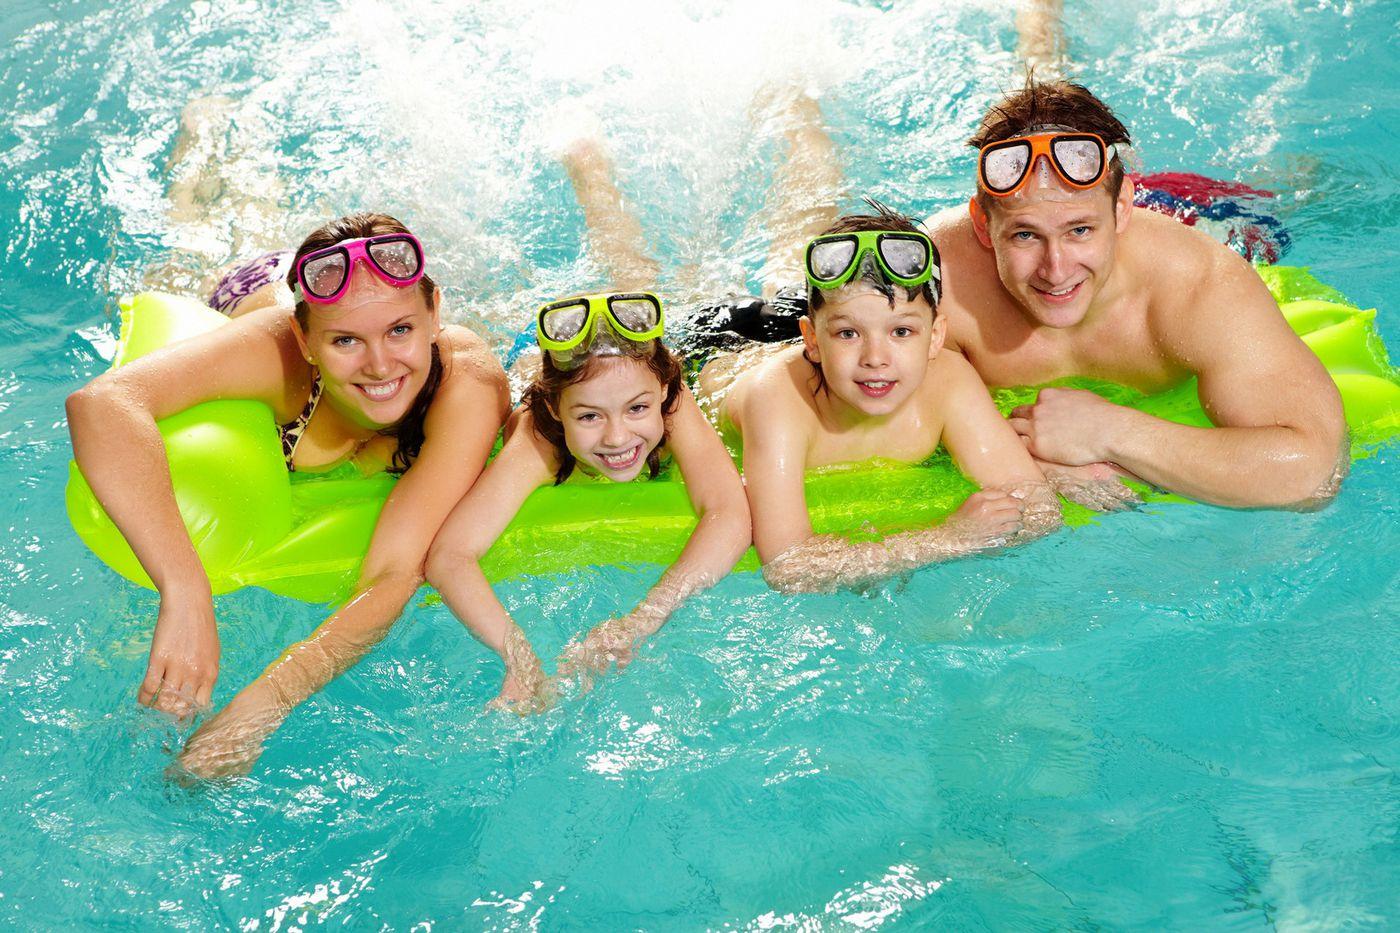 021314424-cheerful-family-swimming-pool-.jpeg